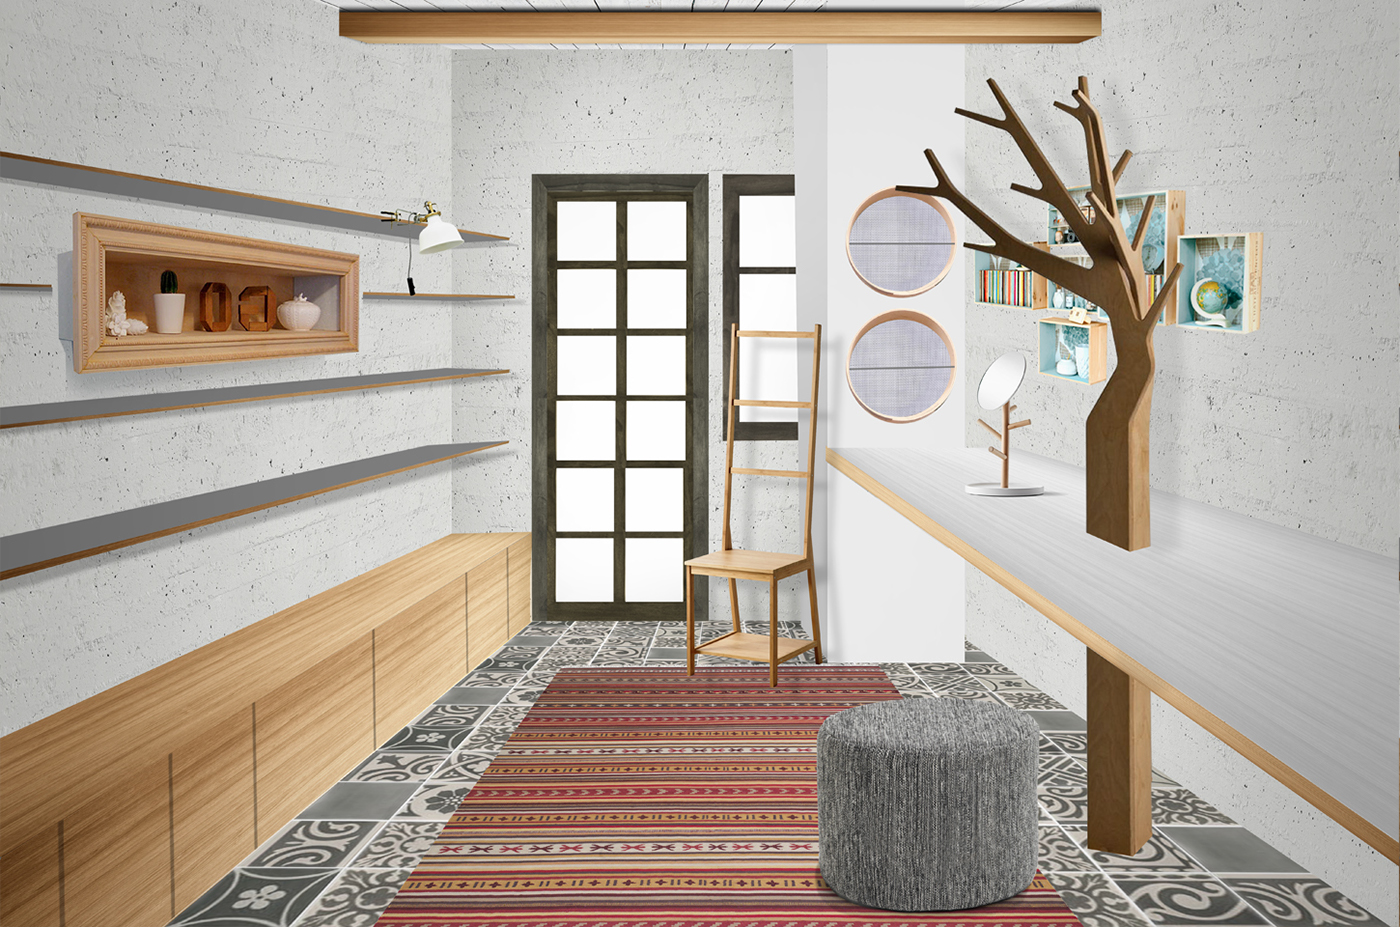 concept small space Logo Design visual identity interior design  Signage Greece Trikala Korinthias traditional & modern